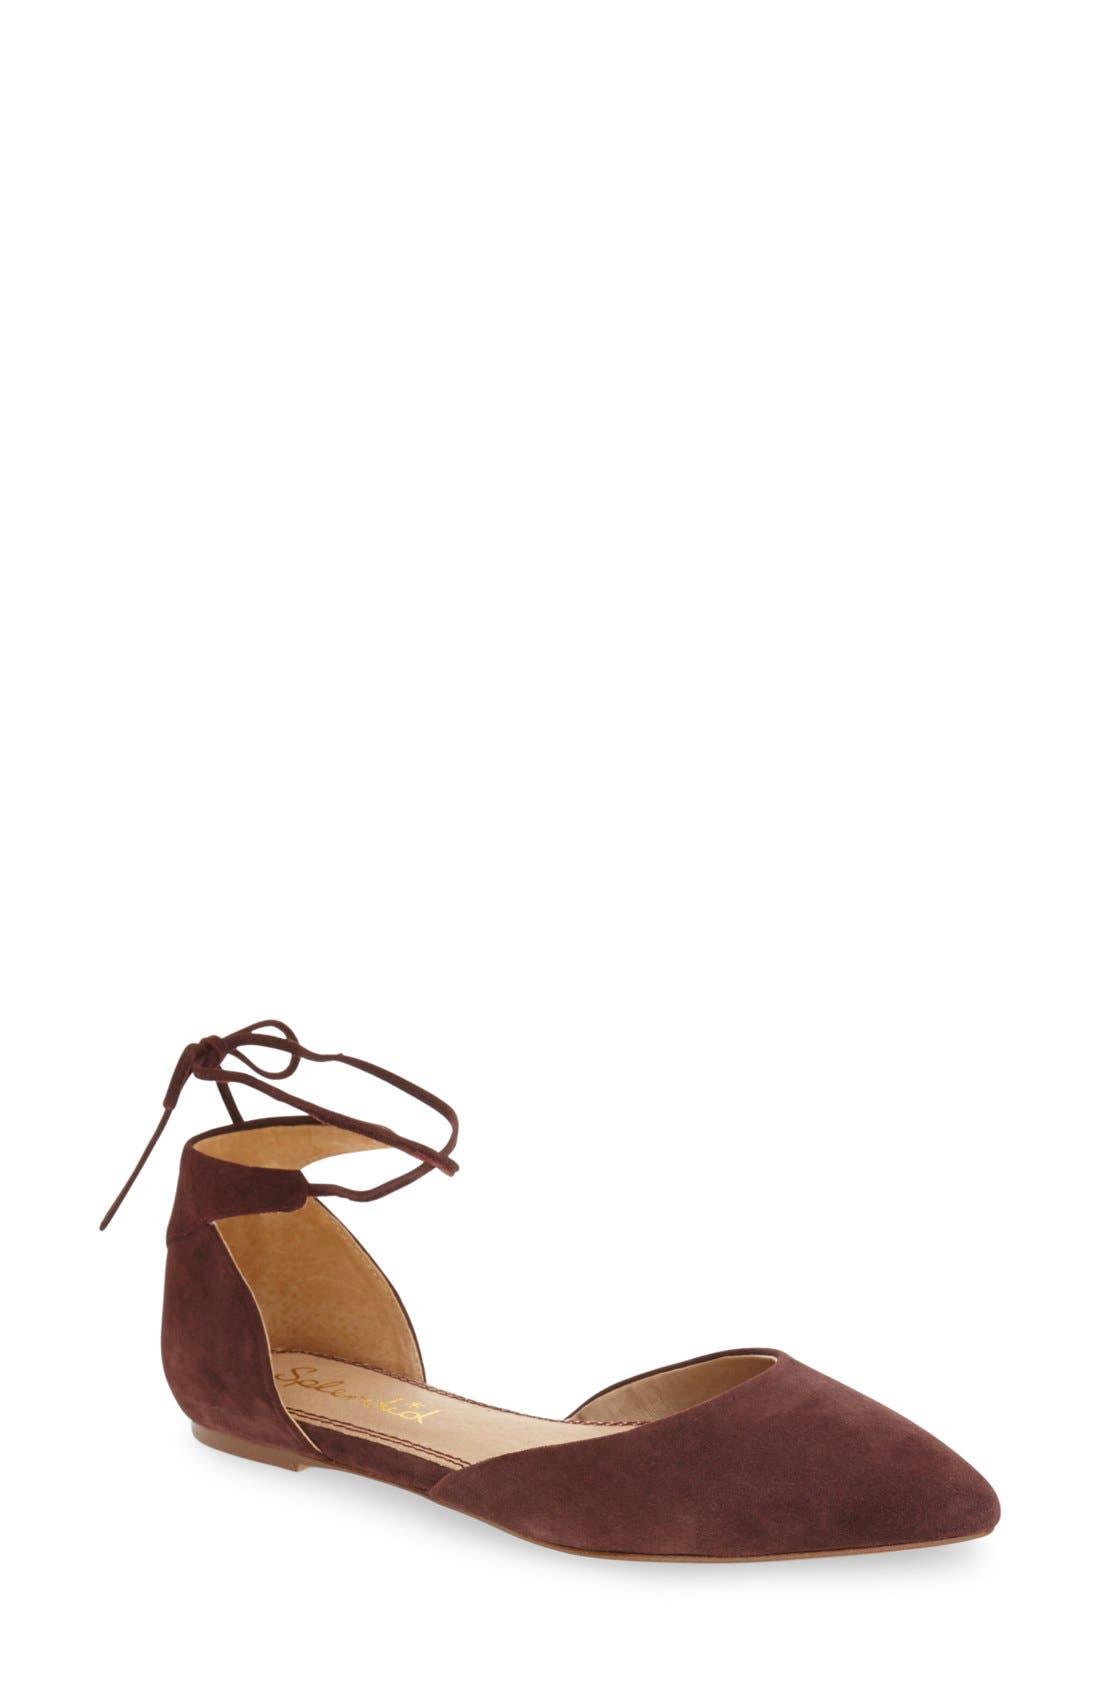 Main Image - Splendid 'Annabelle' Lace-Up d'Orsay Flat (Women)